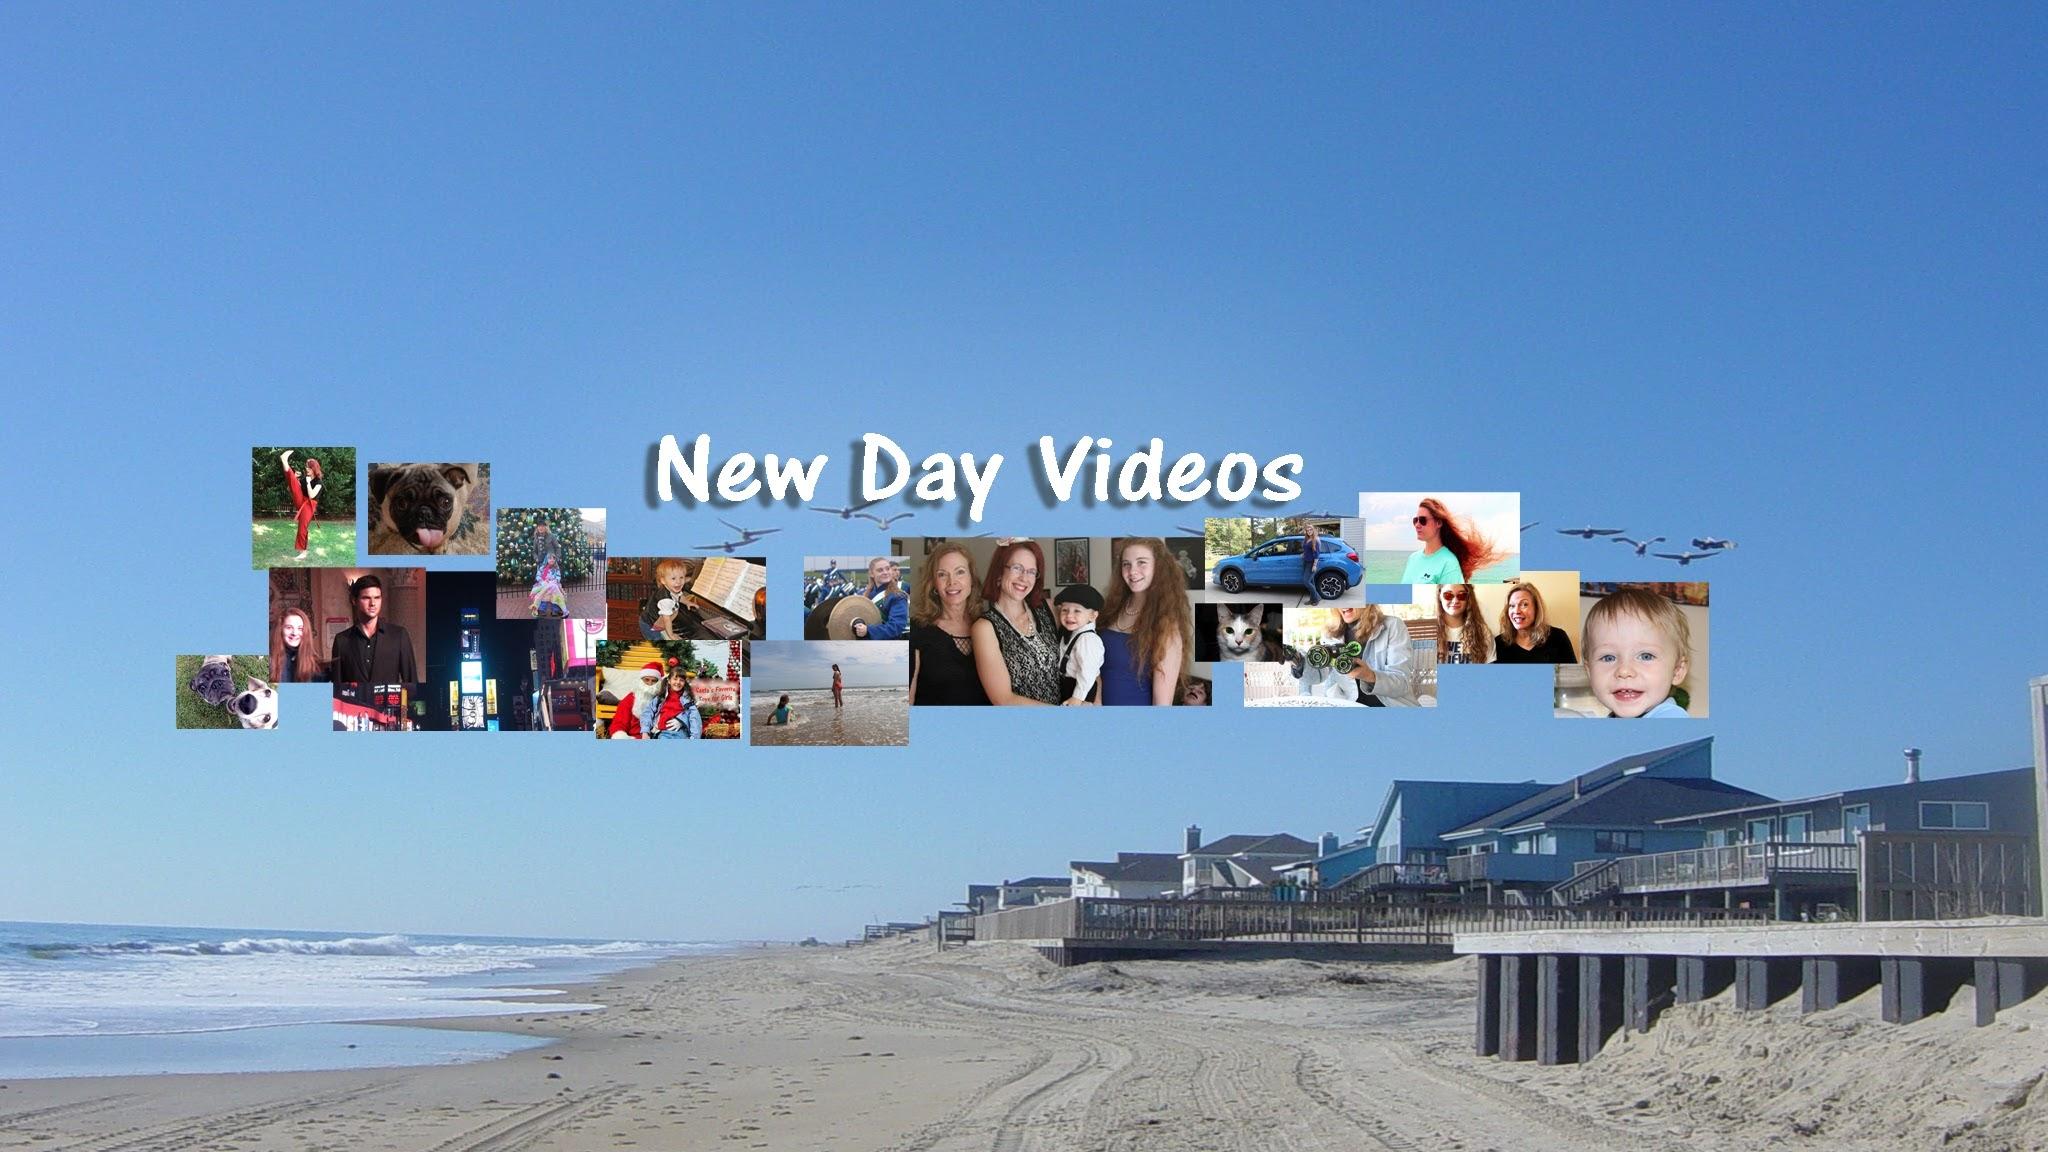 New Day Videos